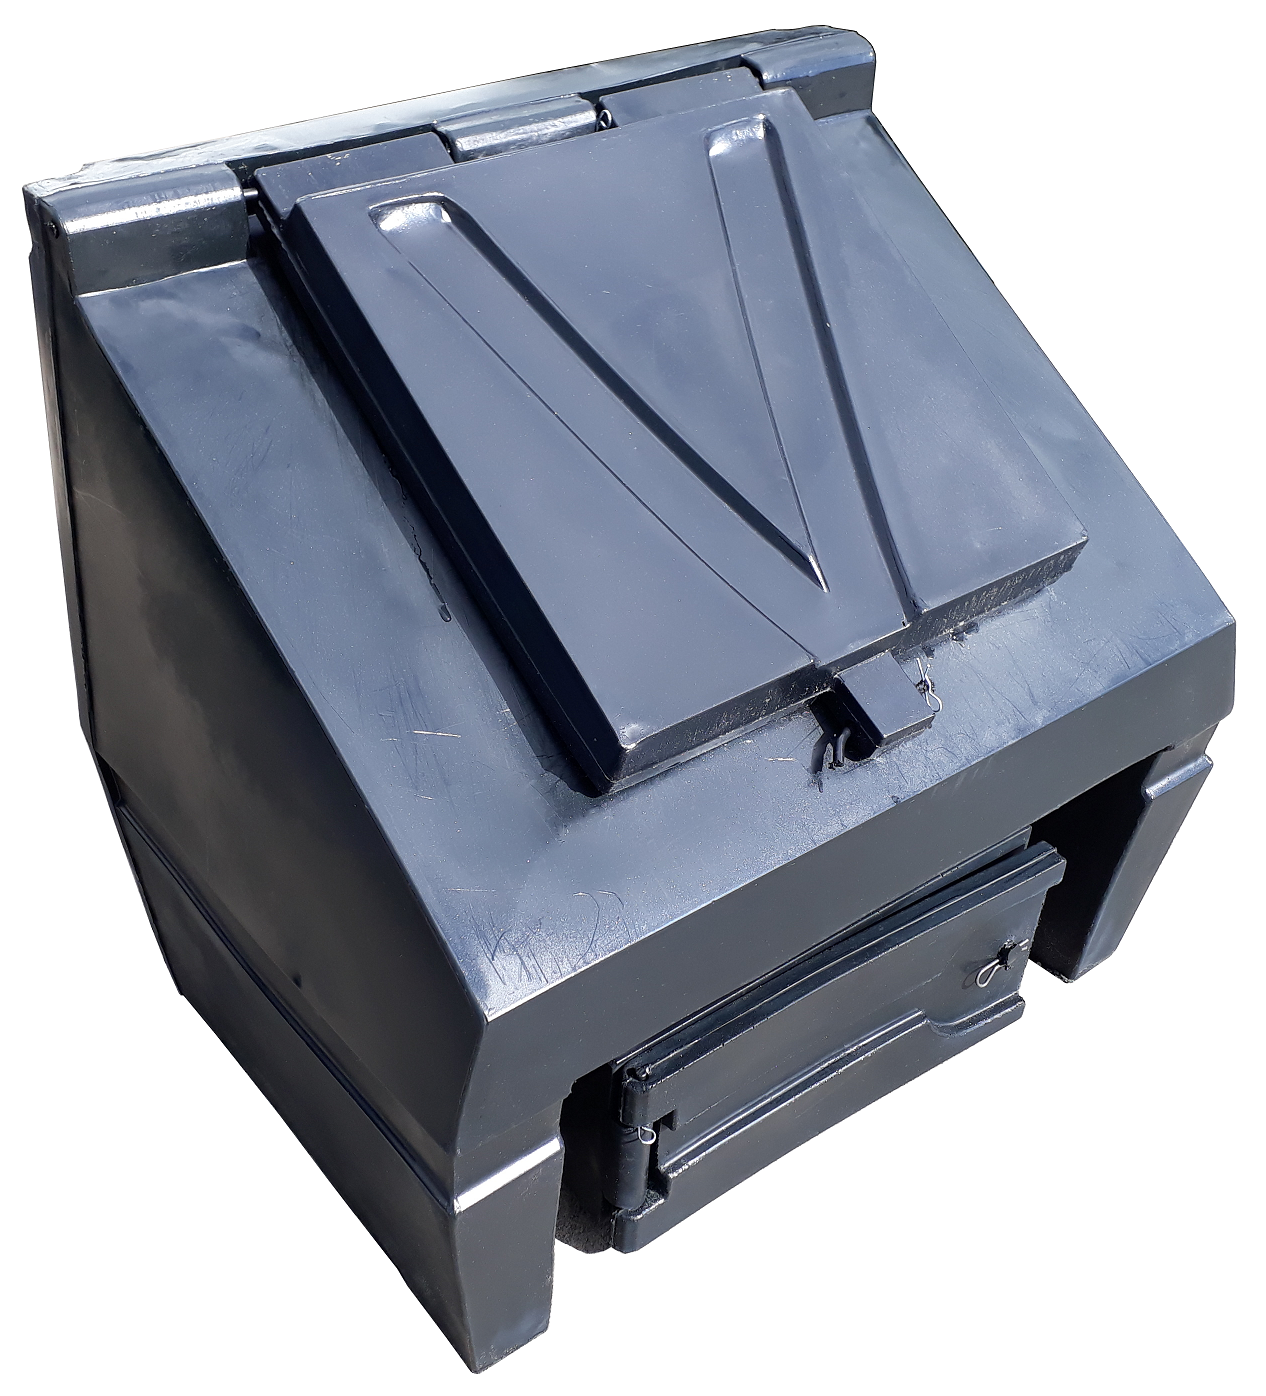 150kg Coal Bunker Image